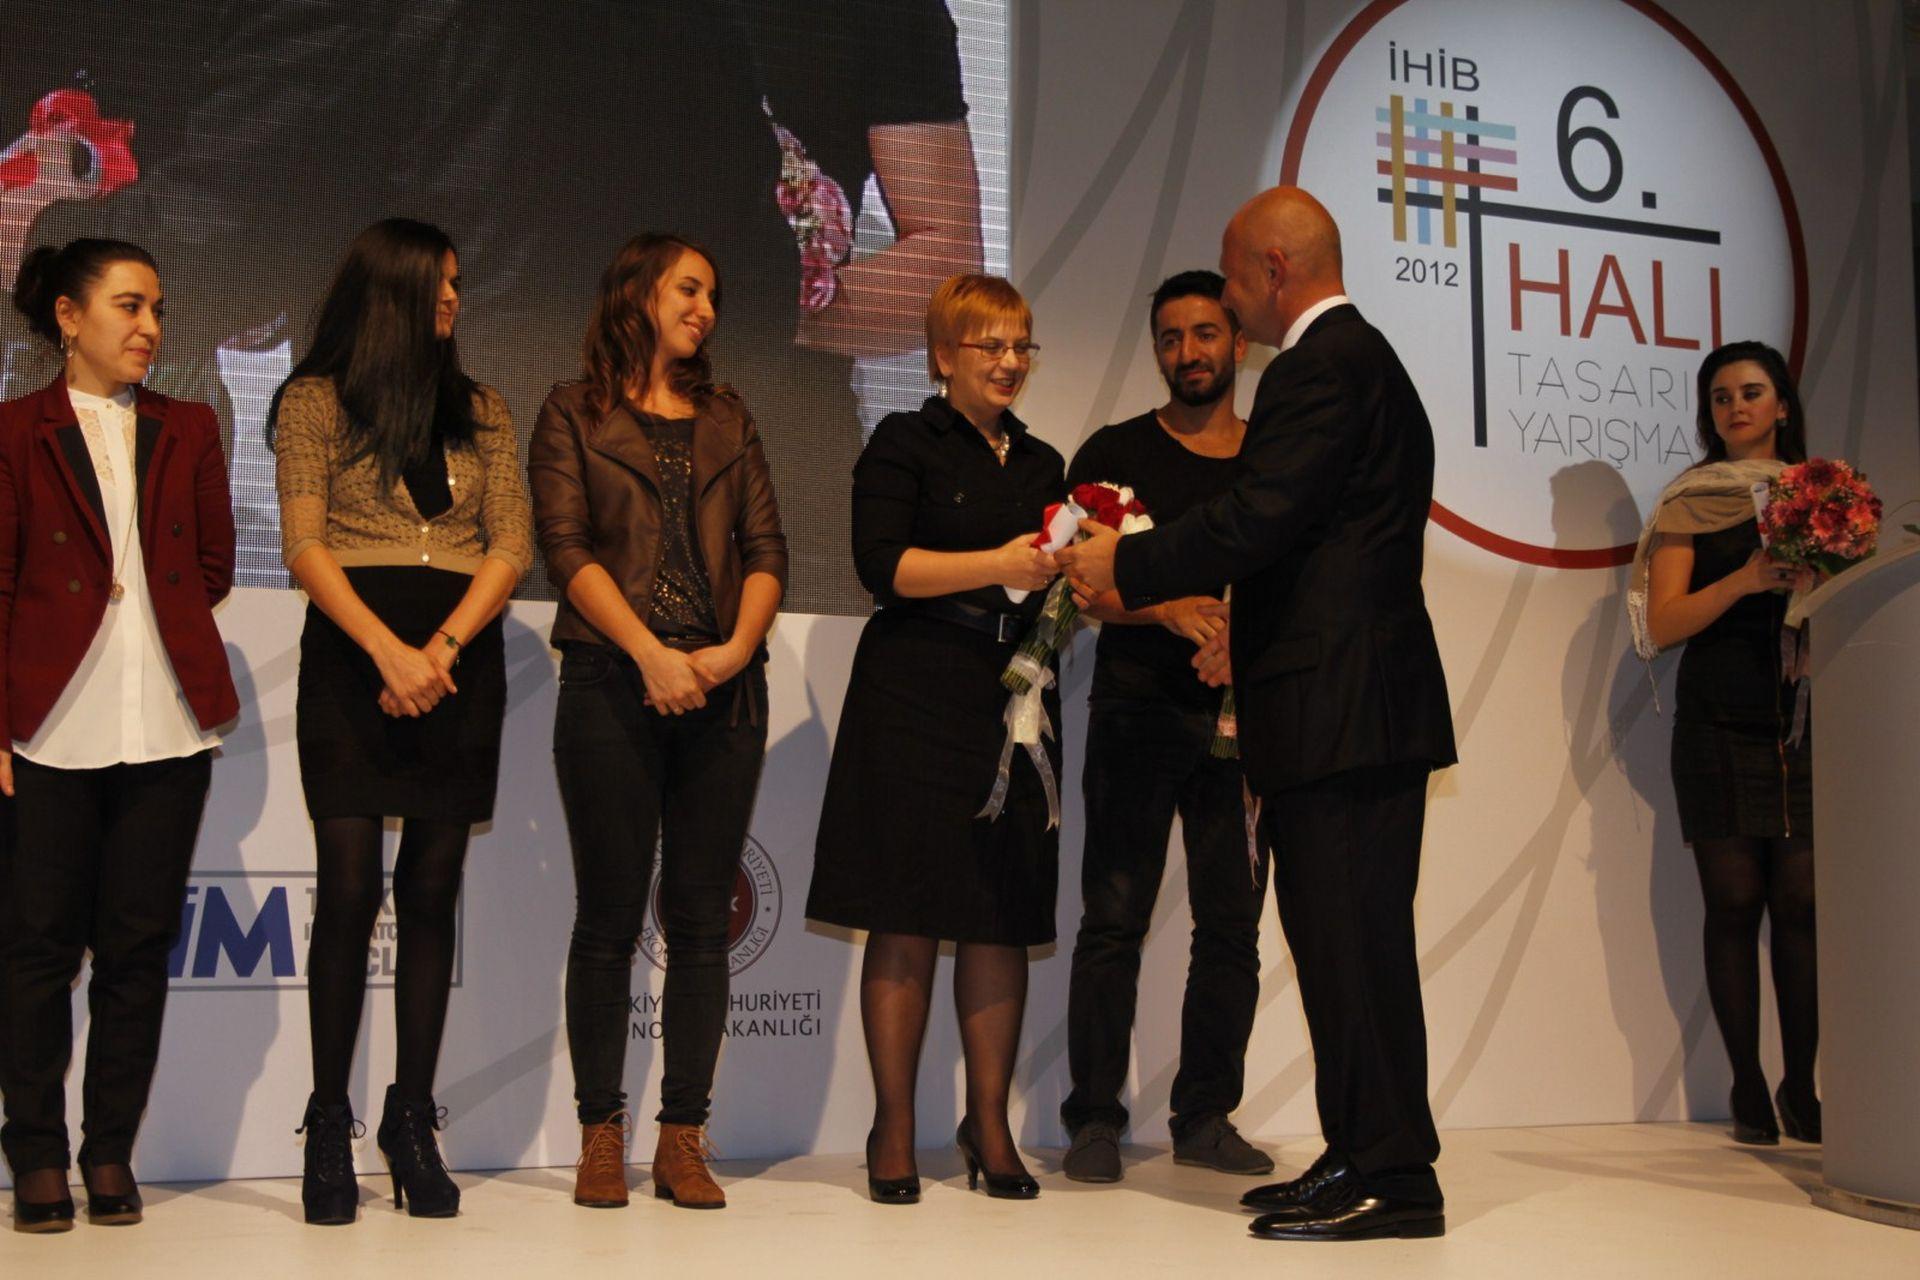 DOMOTEX Turkey 2012 IHIB Carpet Competition Award Ceremony